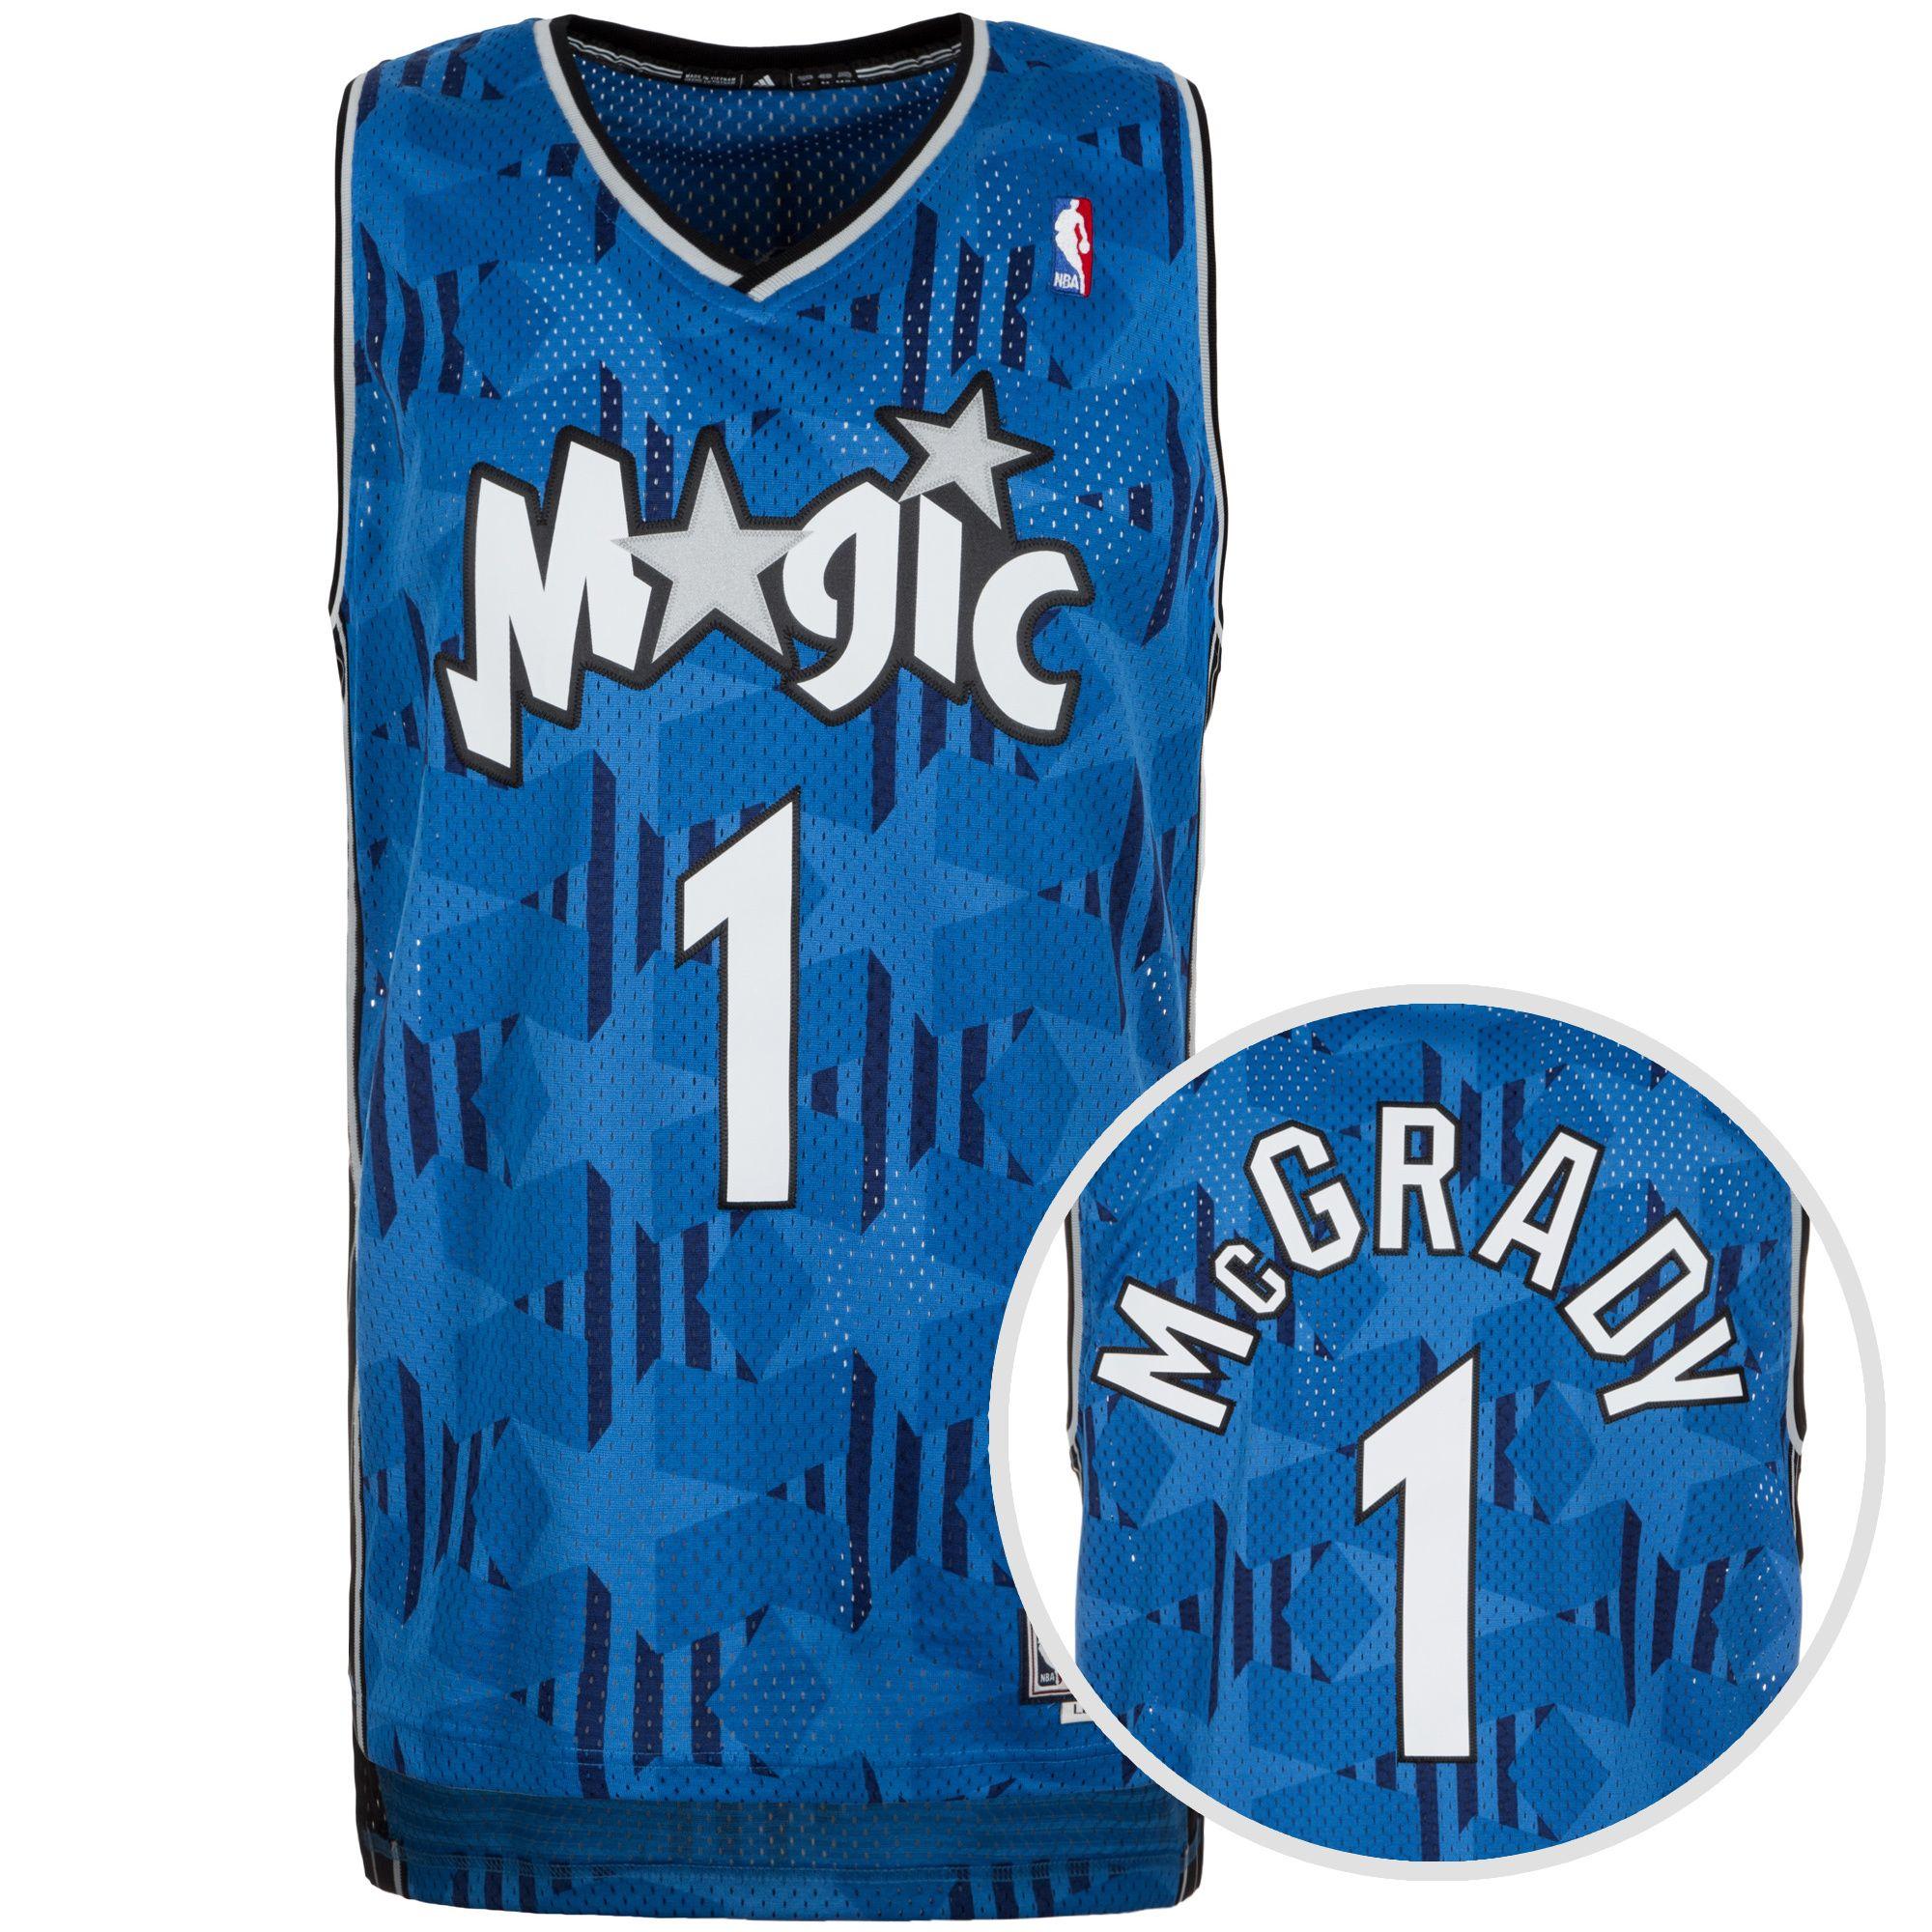 ADIDAS PERFORMANCE adidas Performance Orlando Magic McGrady Swingman Basketballtrikot Herren